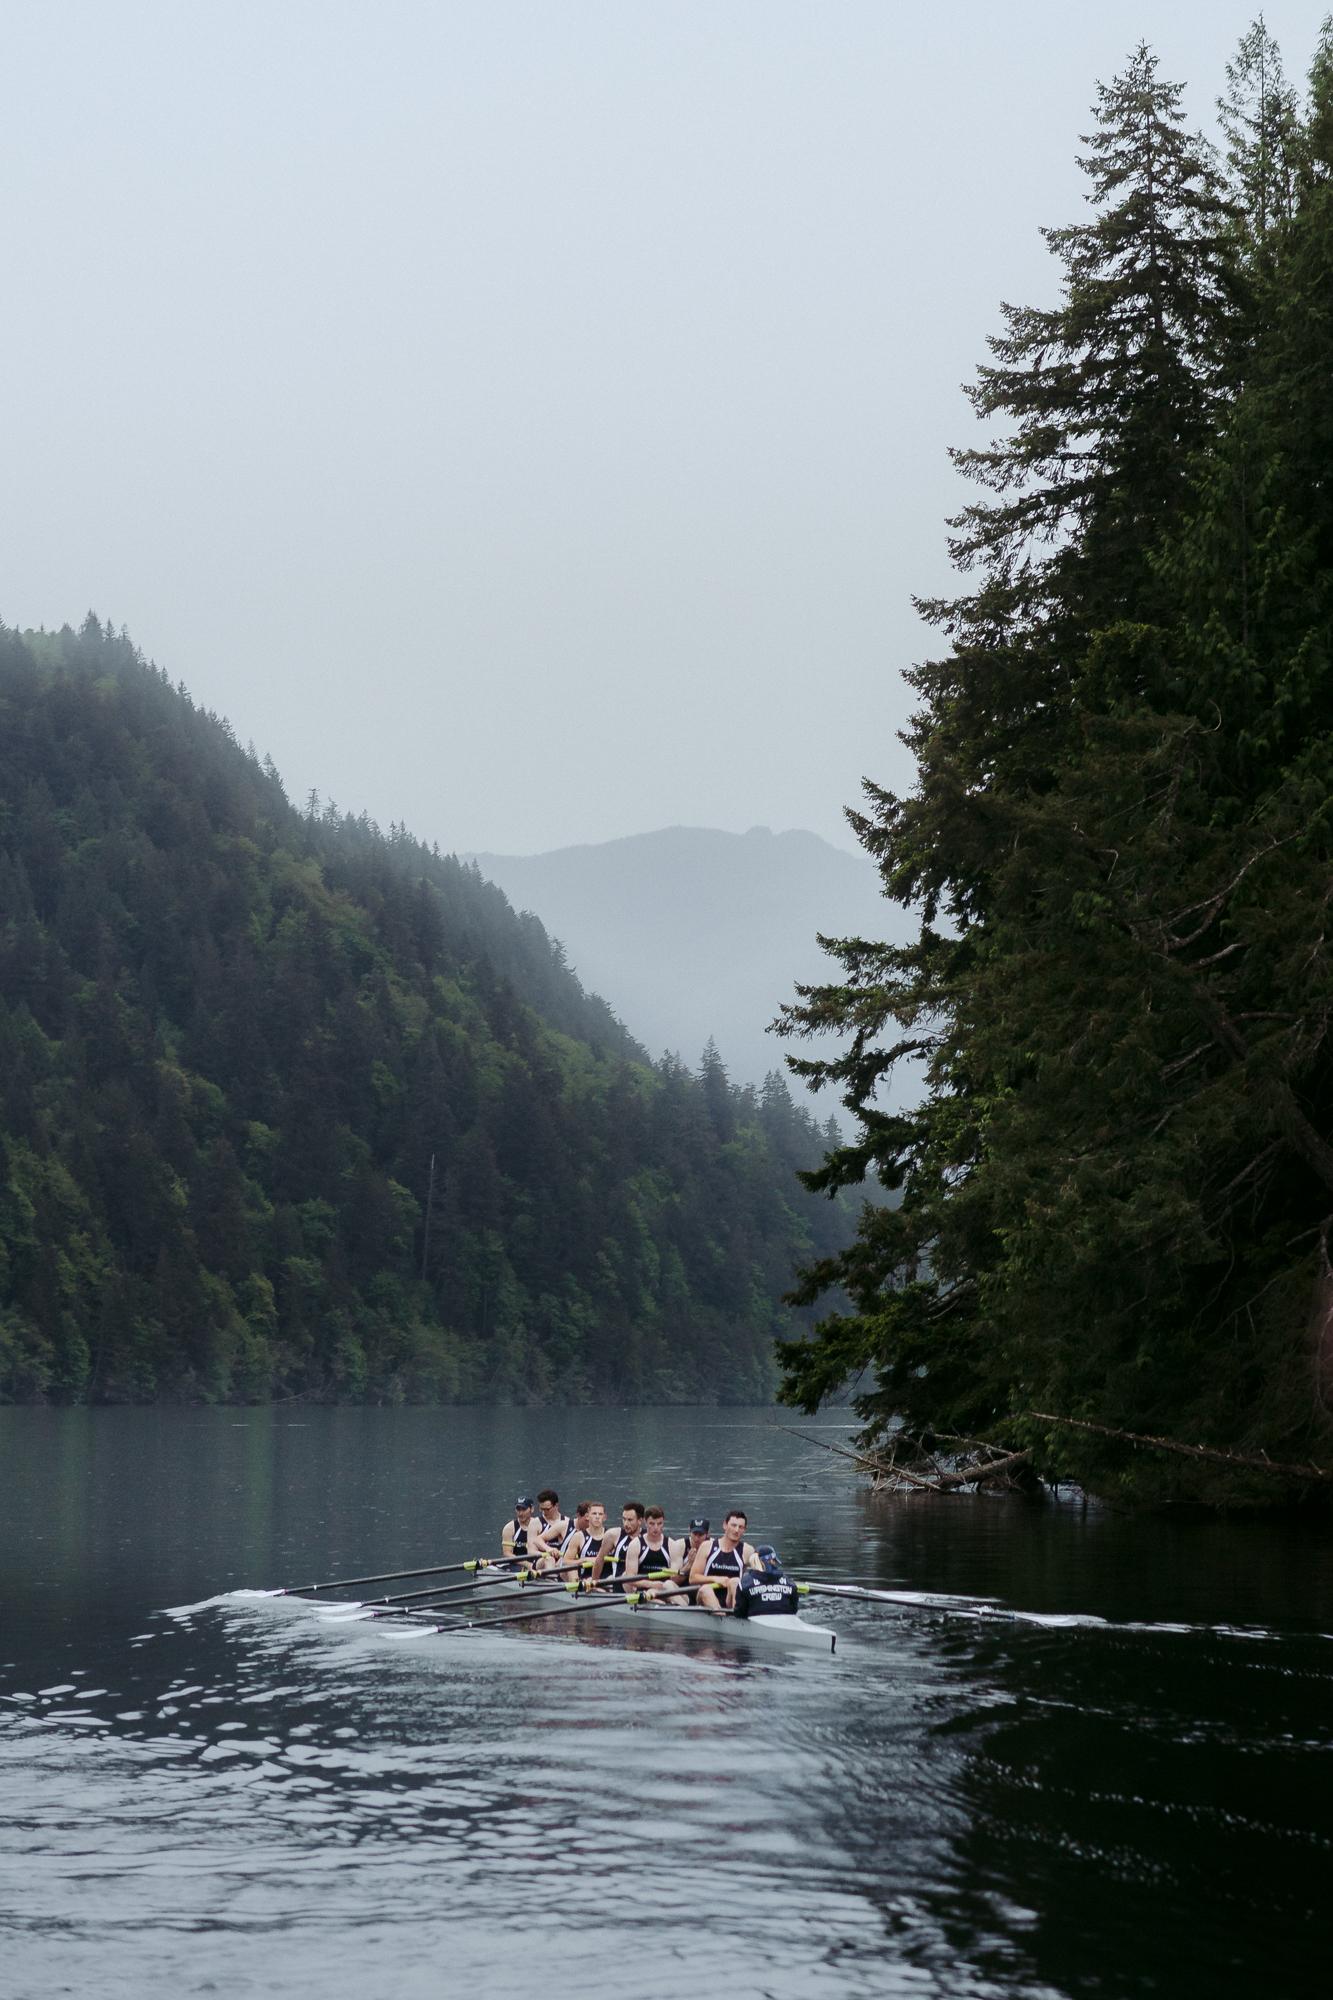 western washington universities rowing team